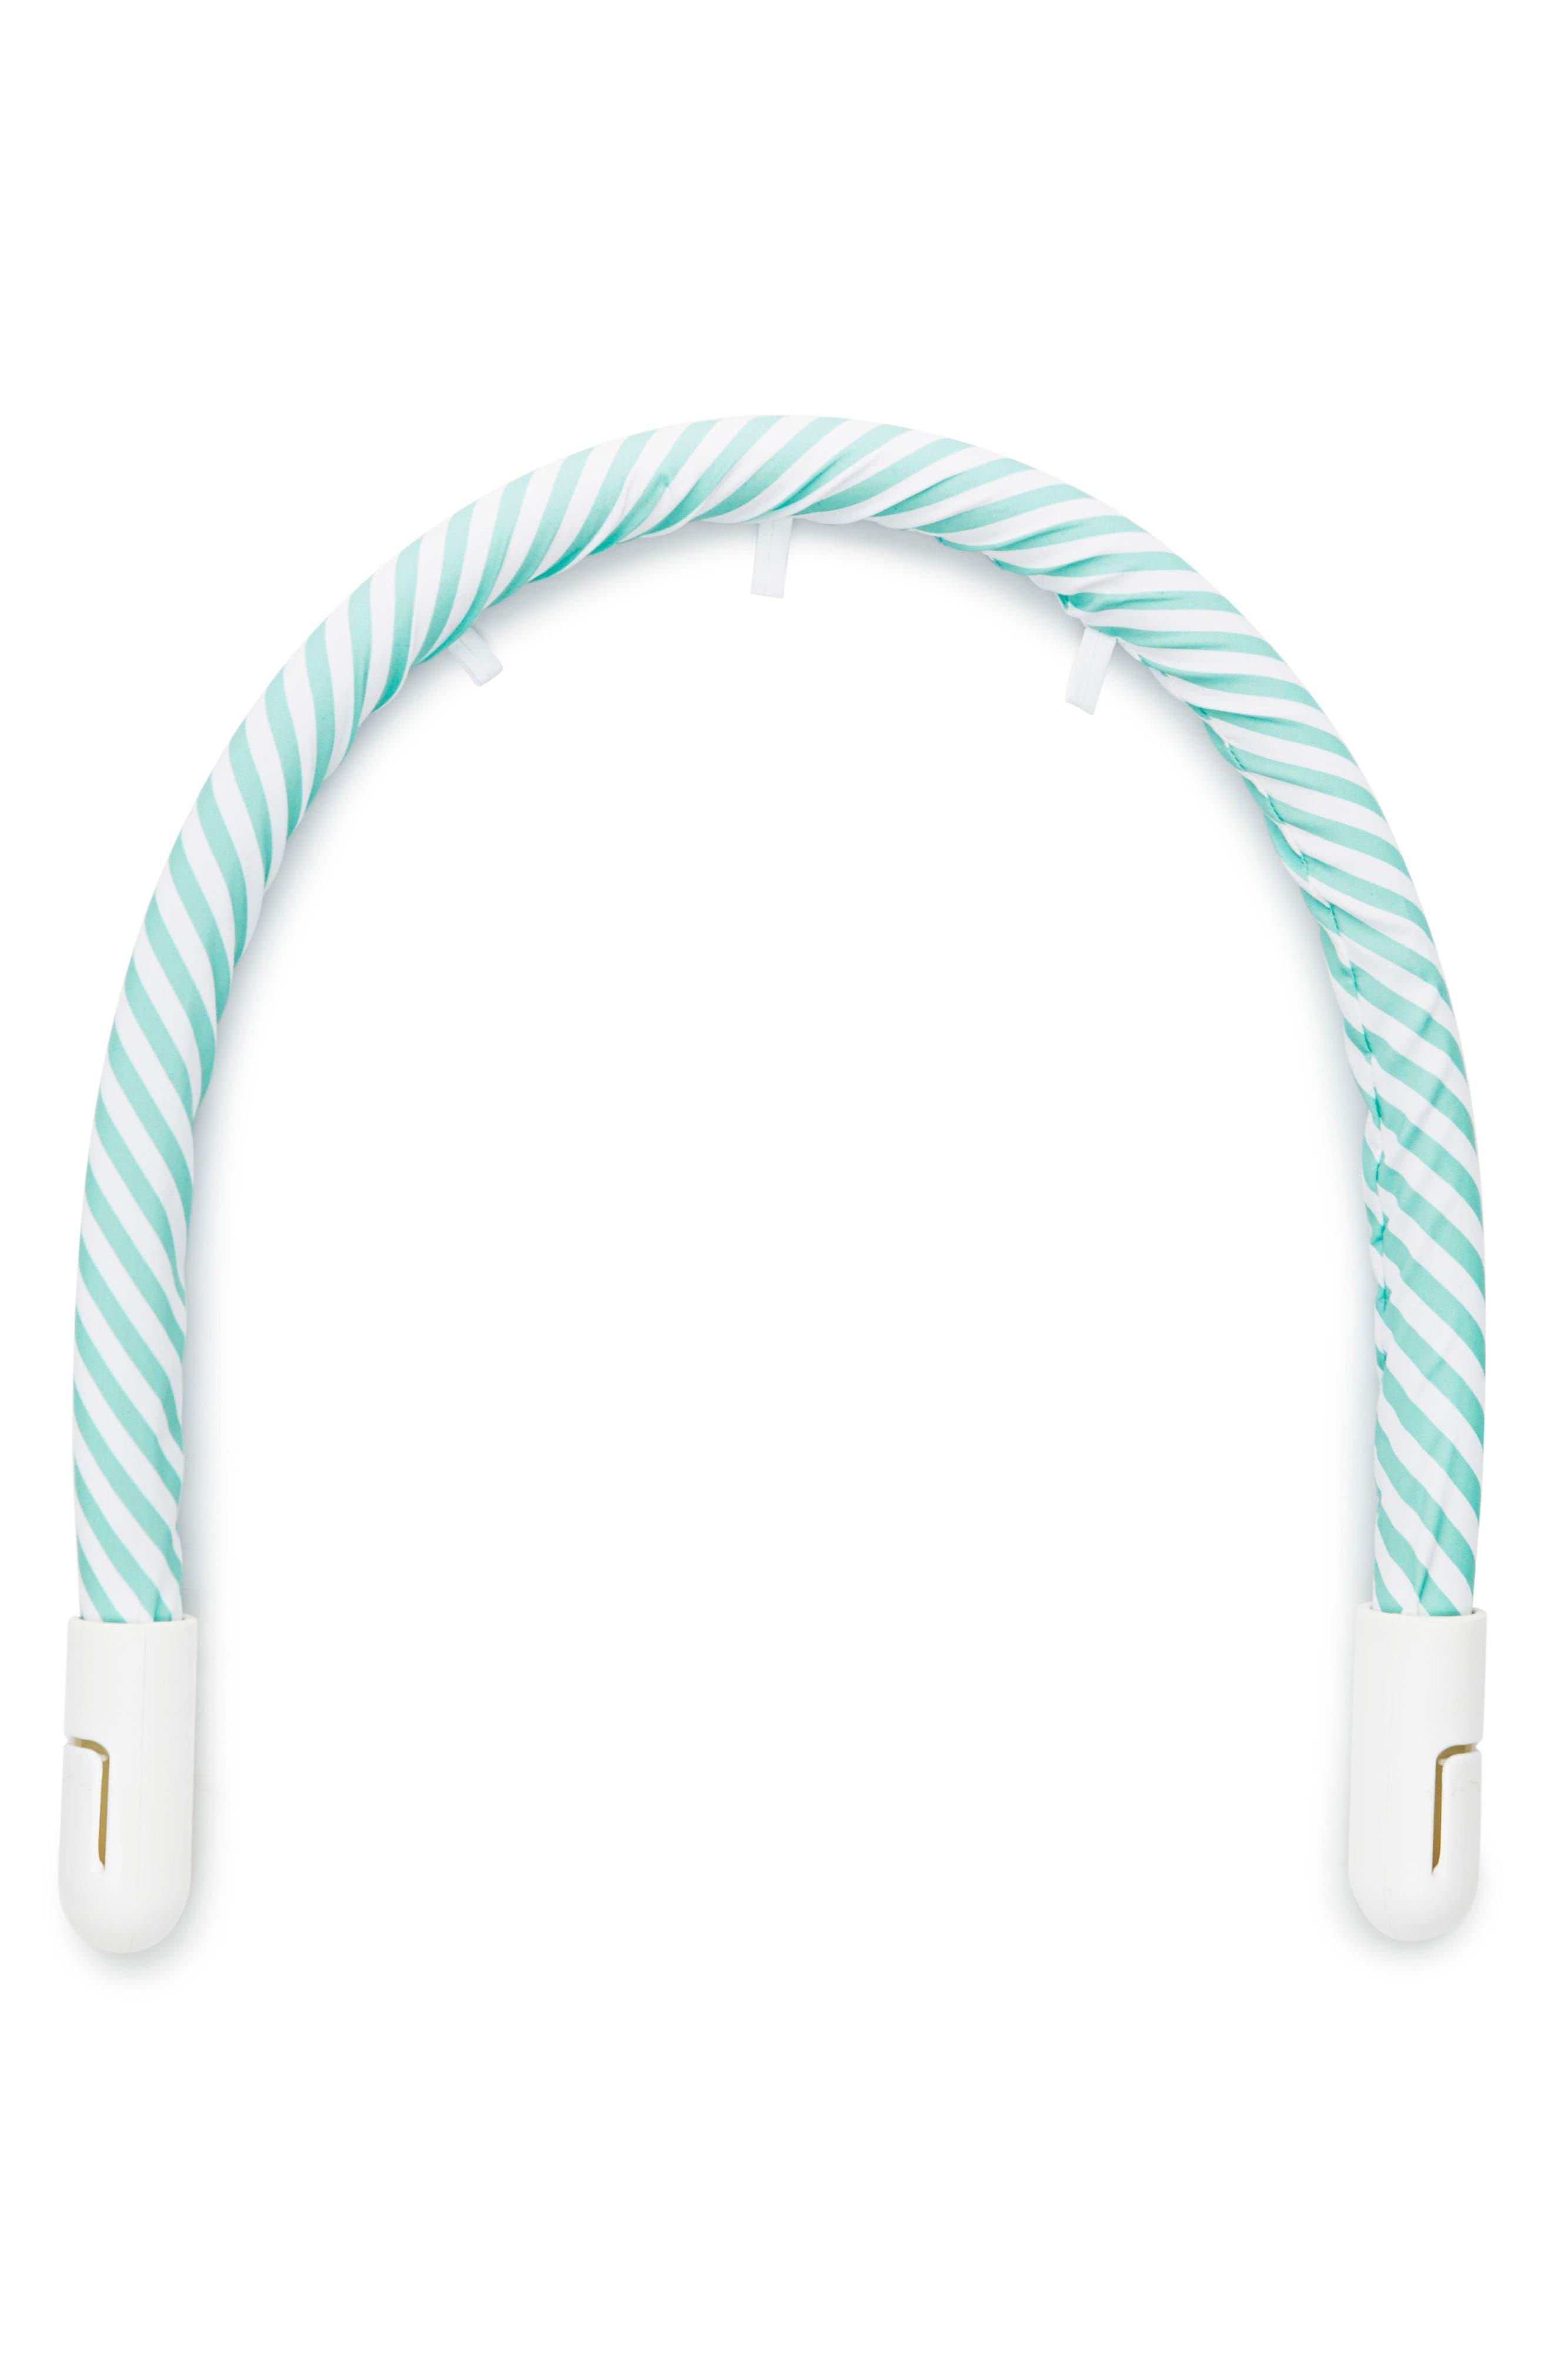 Toy Arch,                         Main,                         color, Aqua/ White